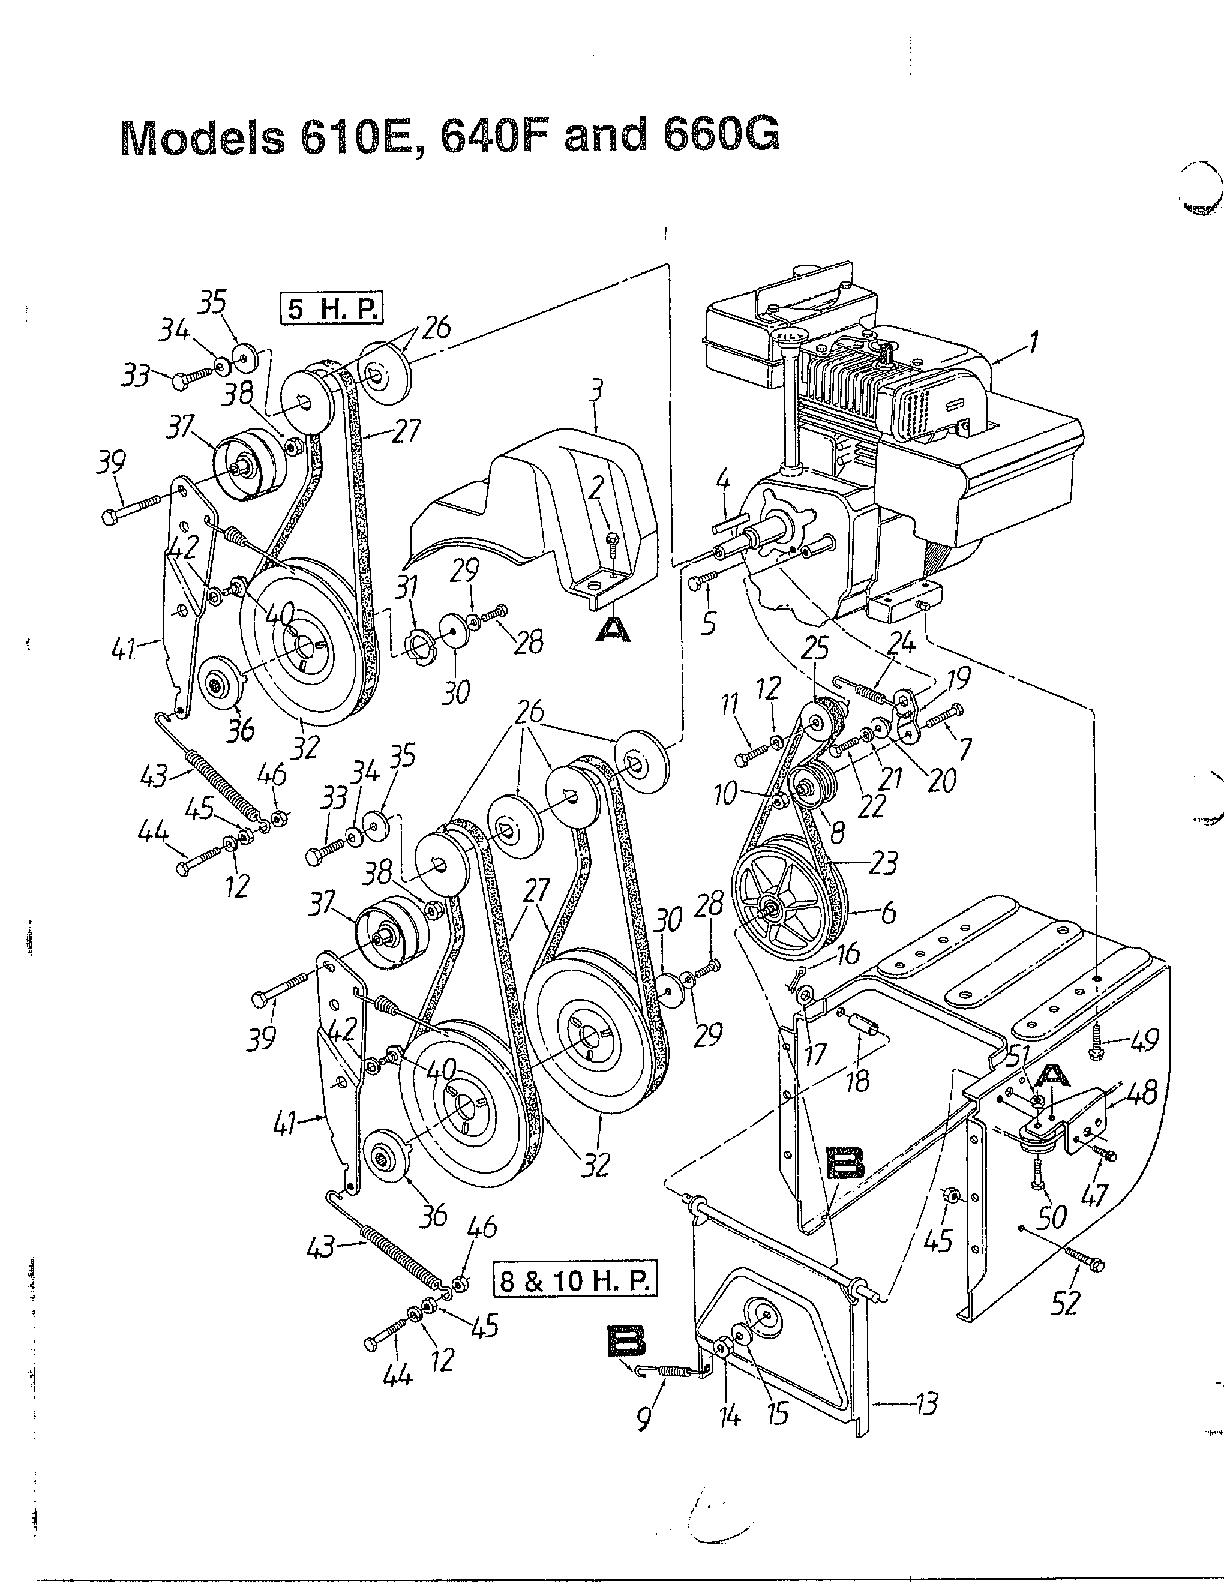 SNOW THROWER Diagram & Parts List for Model 313610E000 Mtd